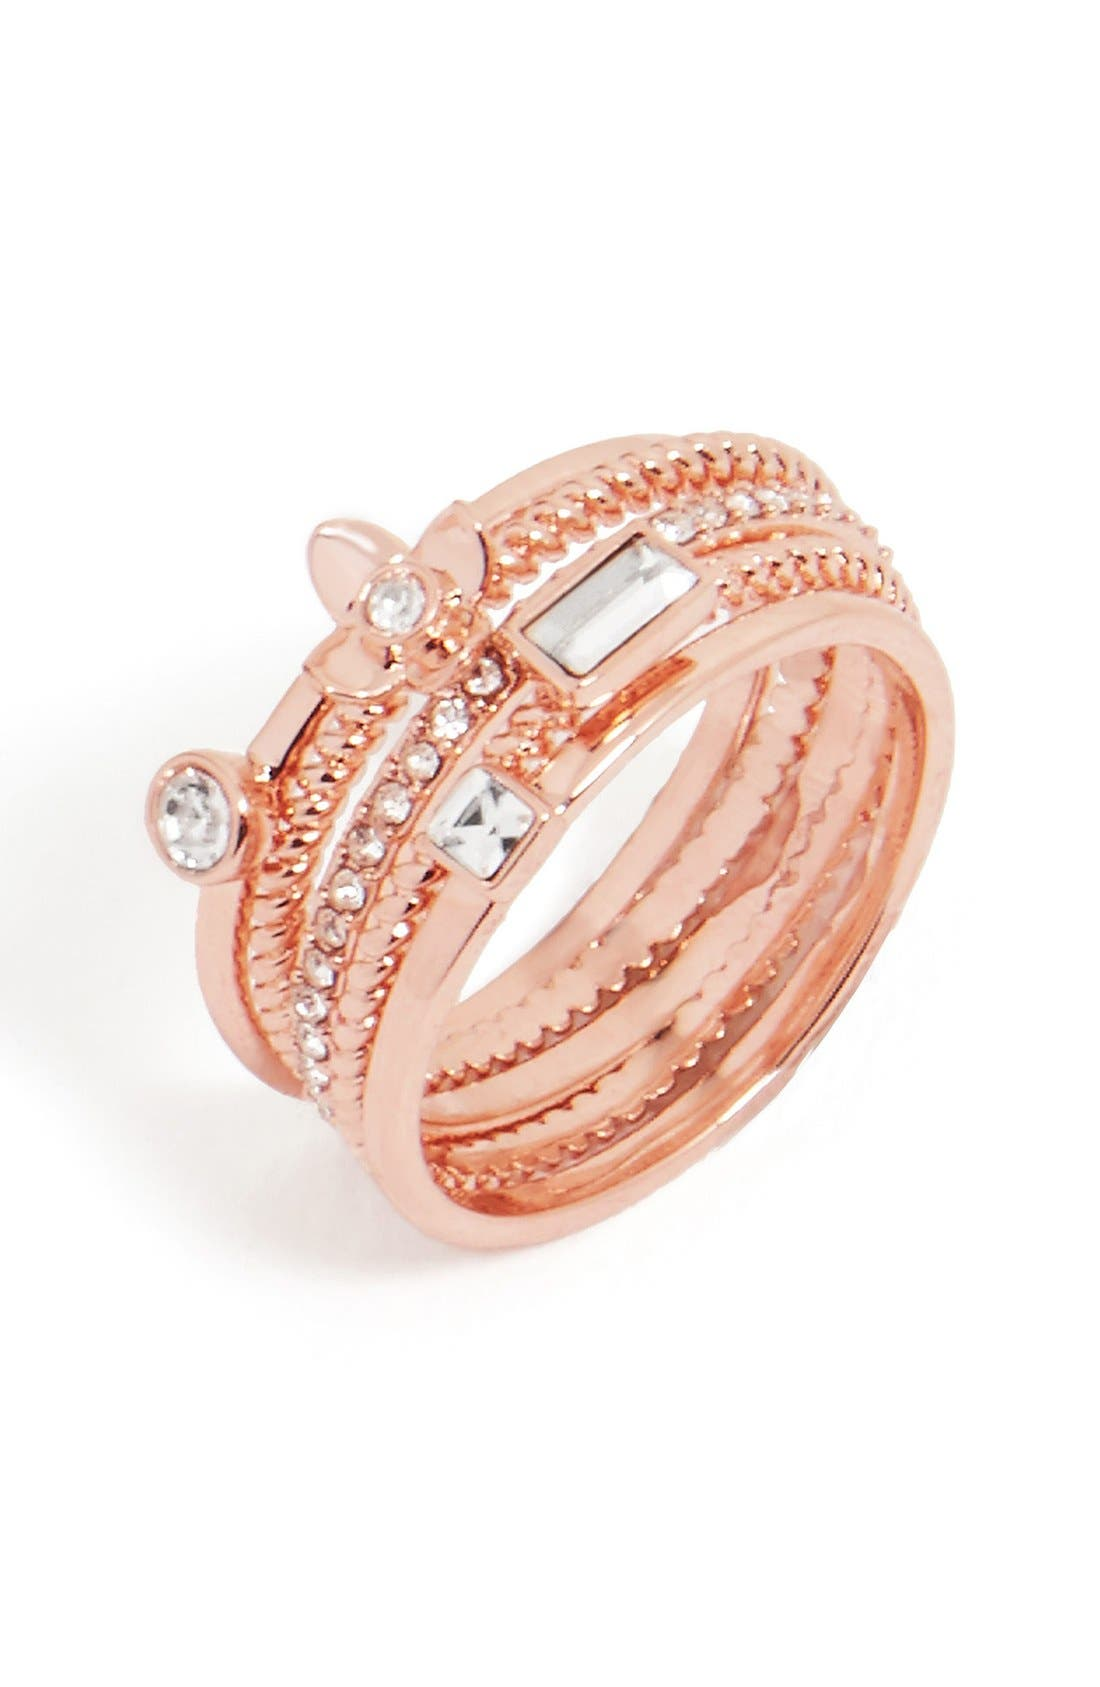 Main Image - BaubleBar 'Rosalba' Crystal Rings (Set of 5)